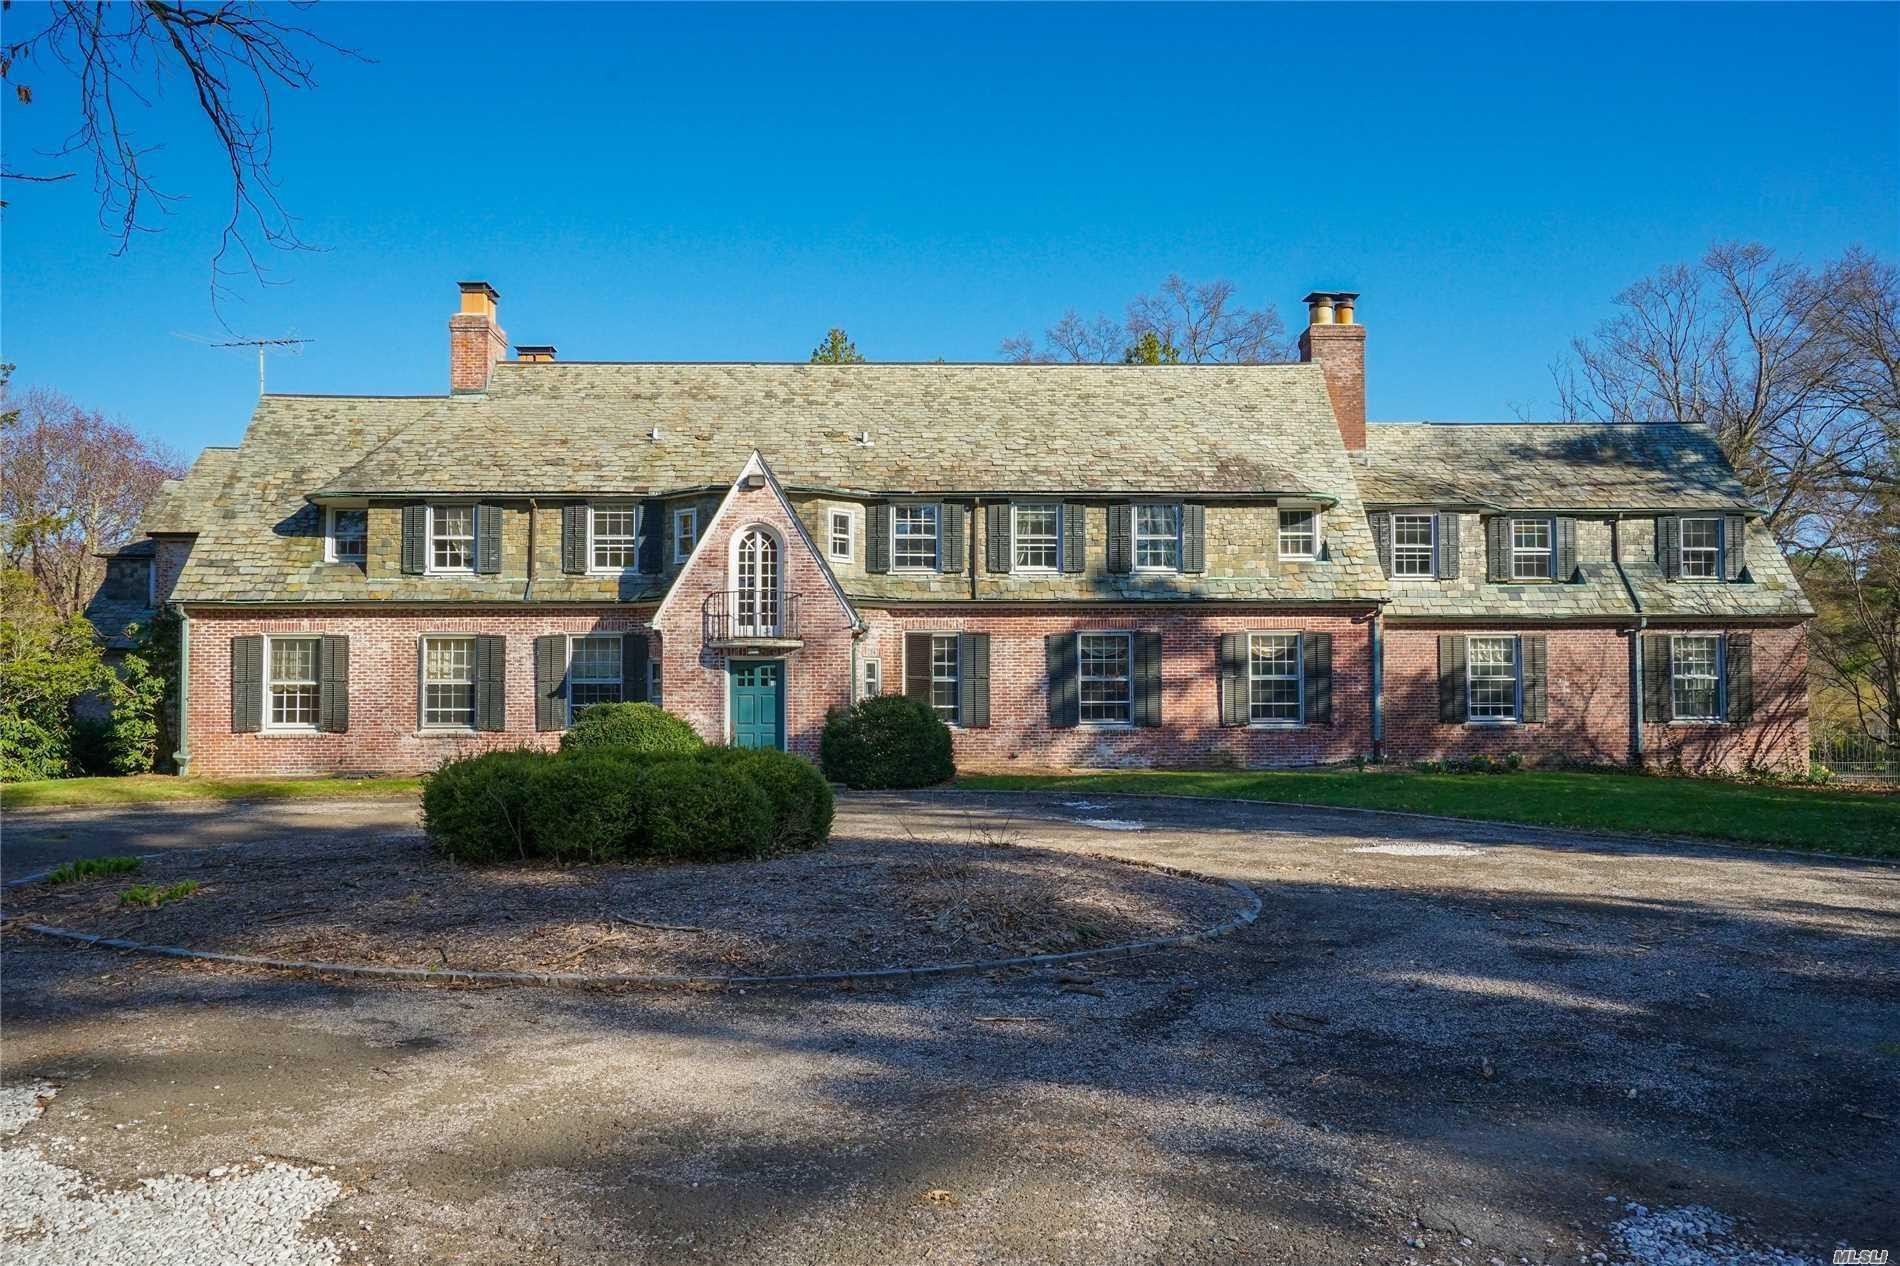 174 Hegemans Ln - Old Brookville, New York